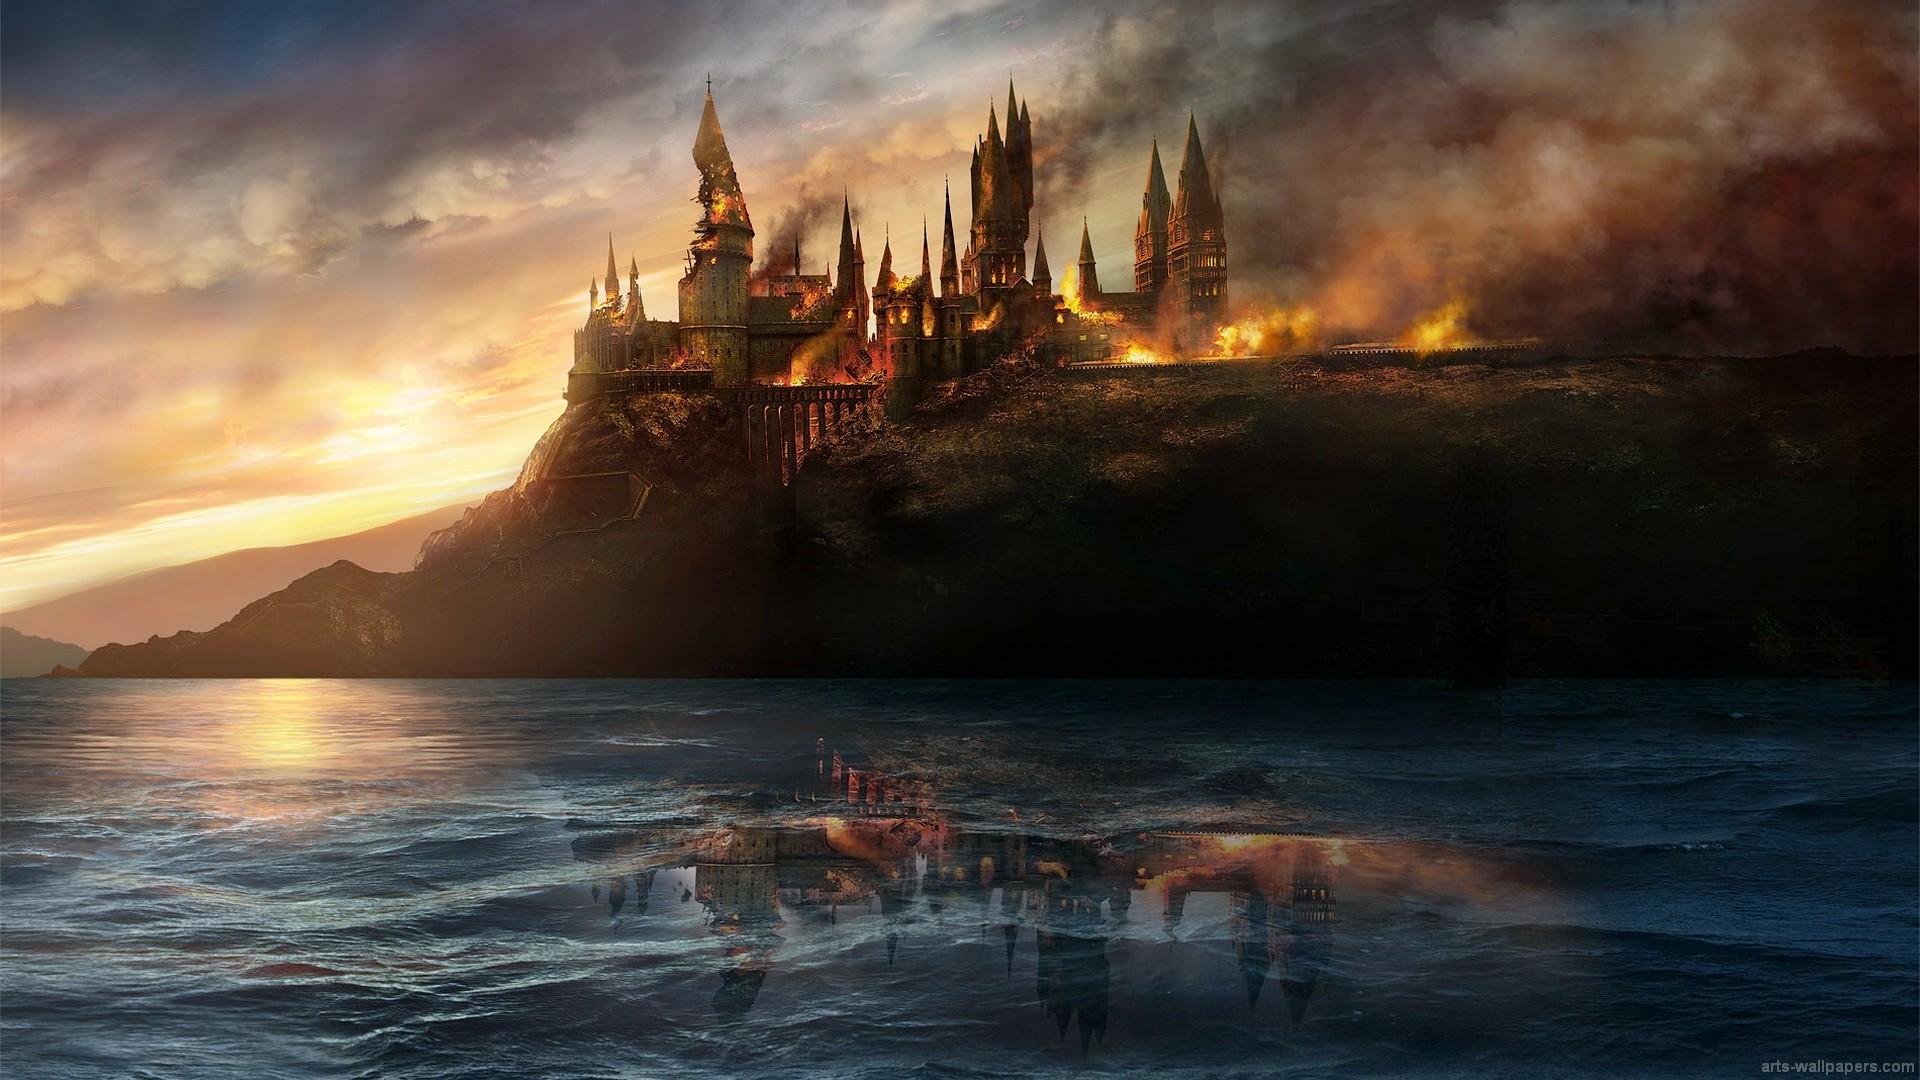 Popular Wallpaper Harry Potter Artistic - sunset-sea-reflection-sunrise-evening-morning-Harry-Potter-dusk-Hogwarts-ghost-ship-battle-at-hogwarts-cloud-dawn-wave-screenshot-computer-wallpaper-237654  Pictures_457521.jpg